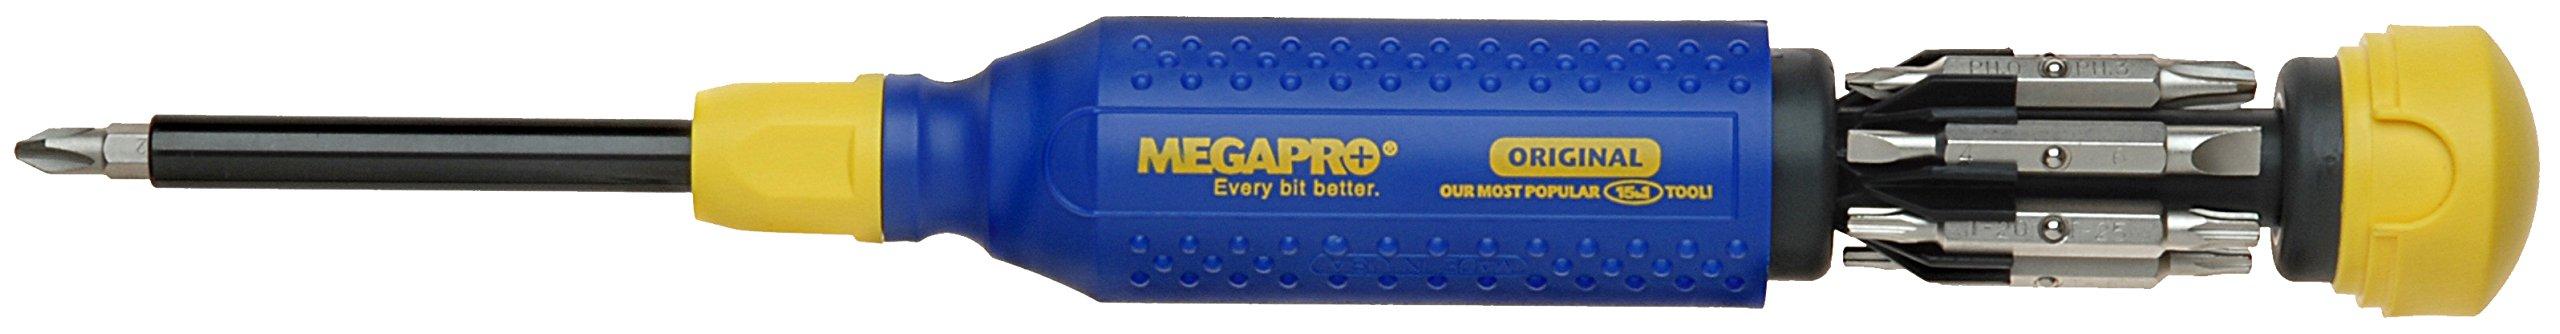 Megapro 151NAS-CS Driver